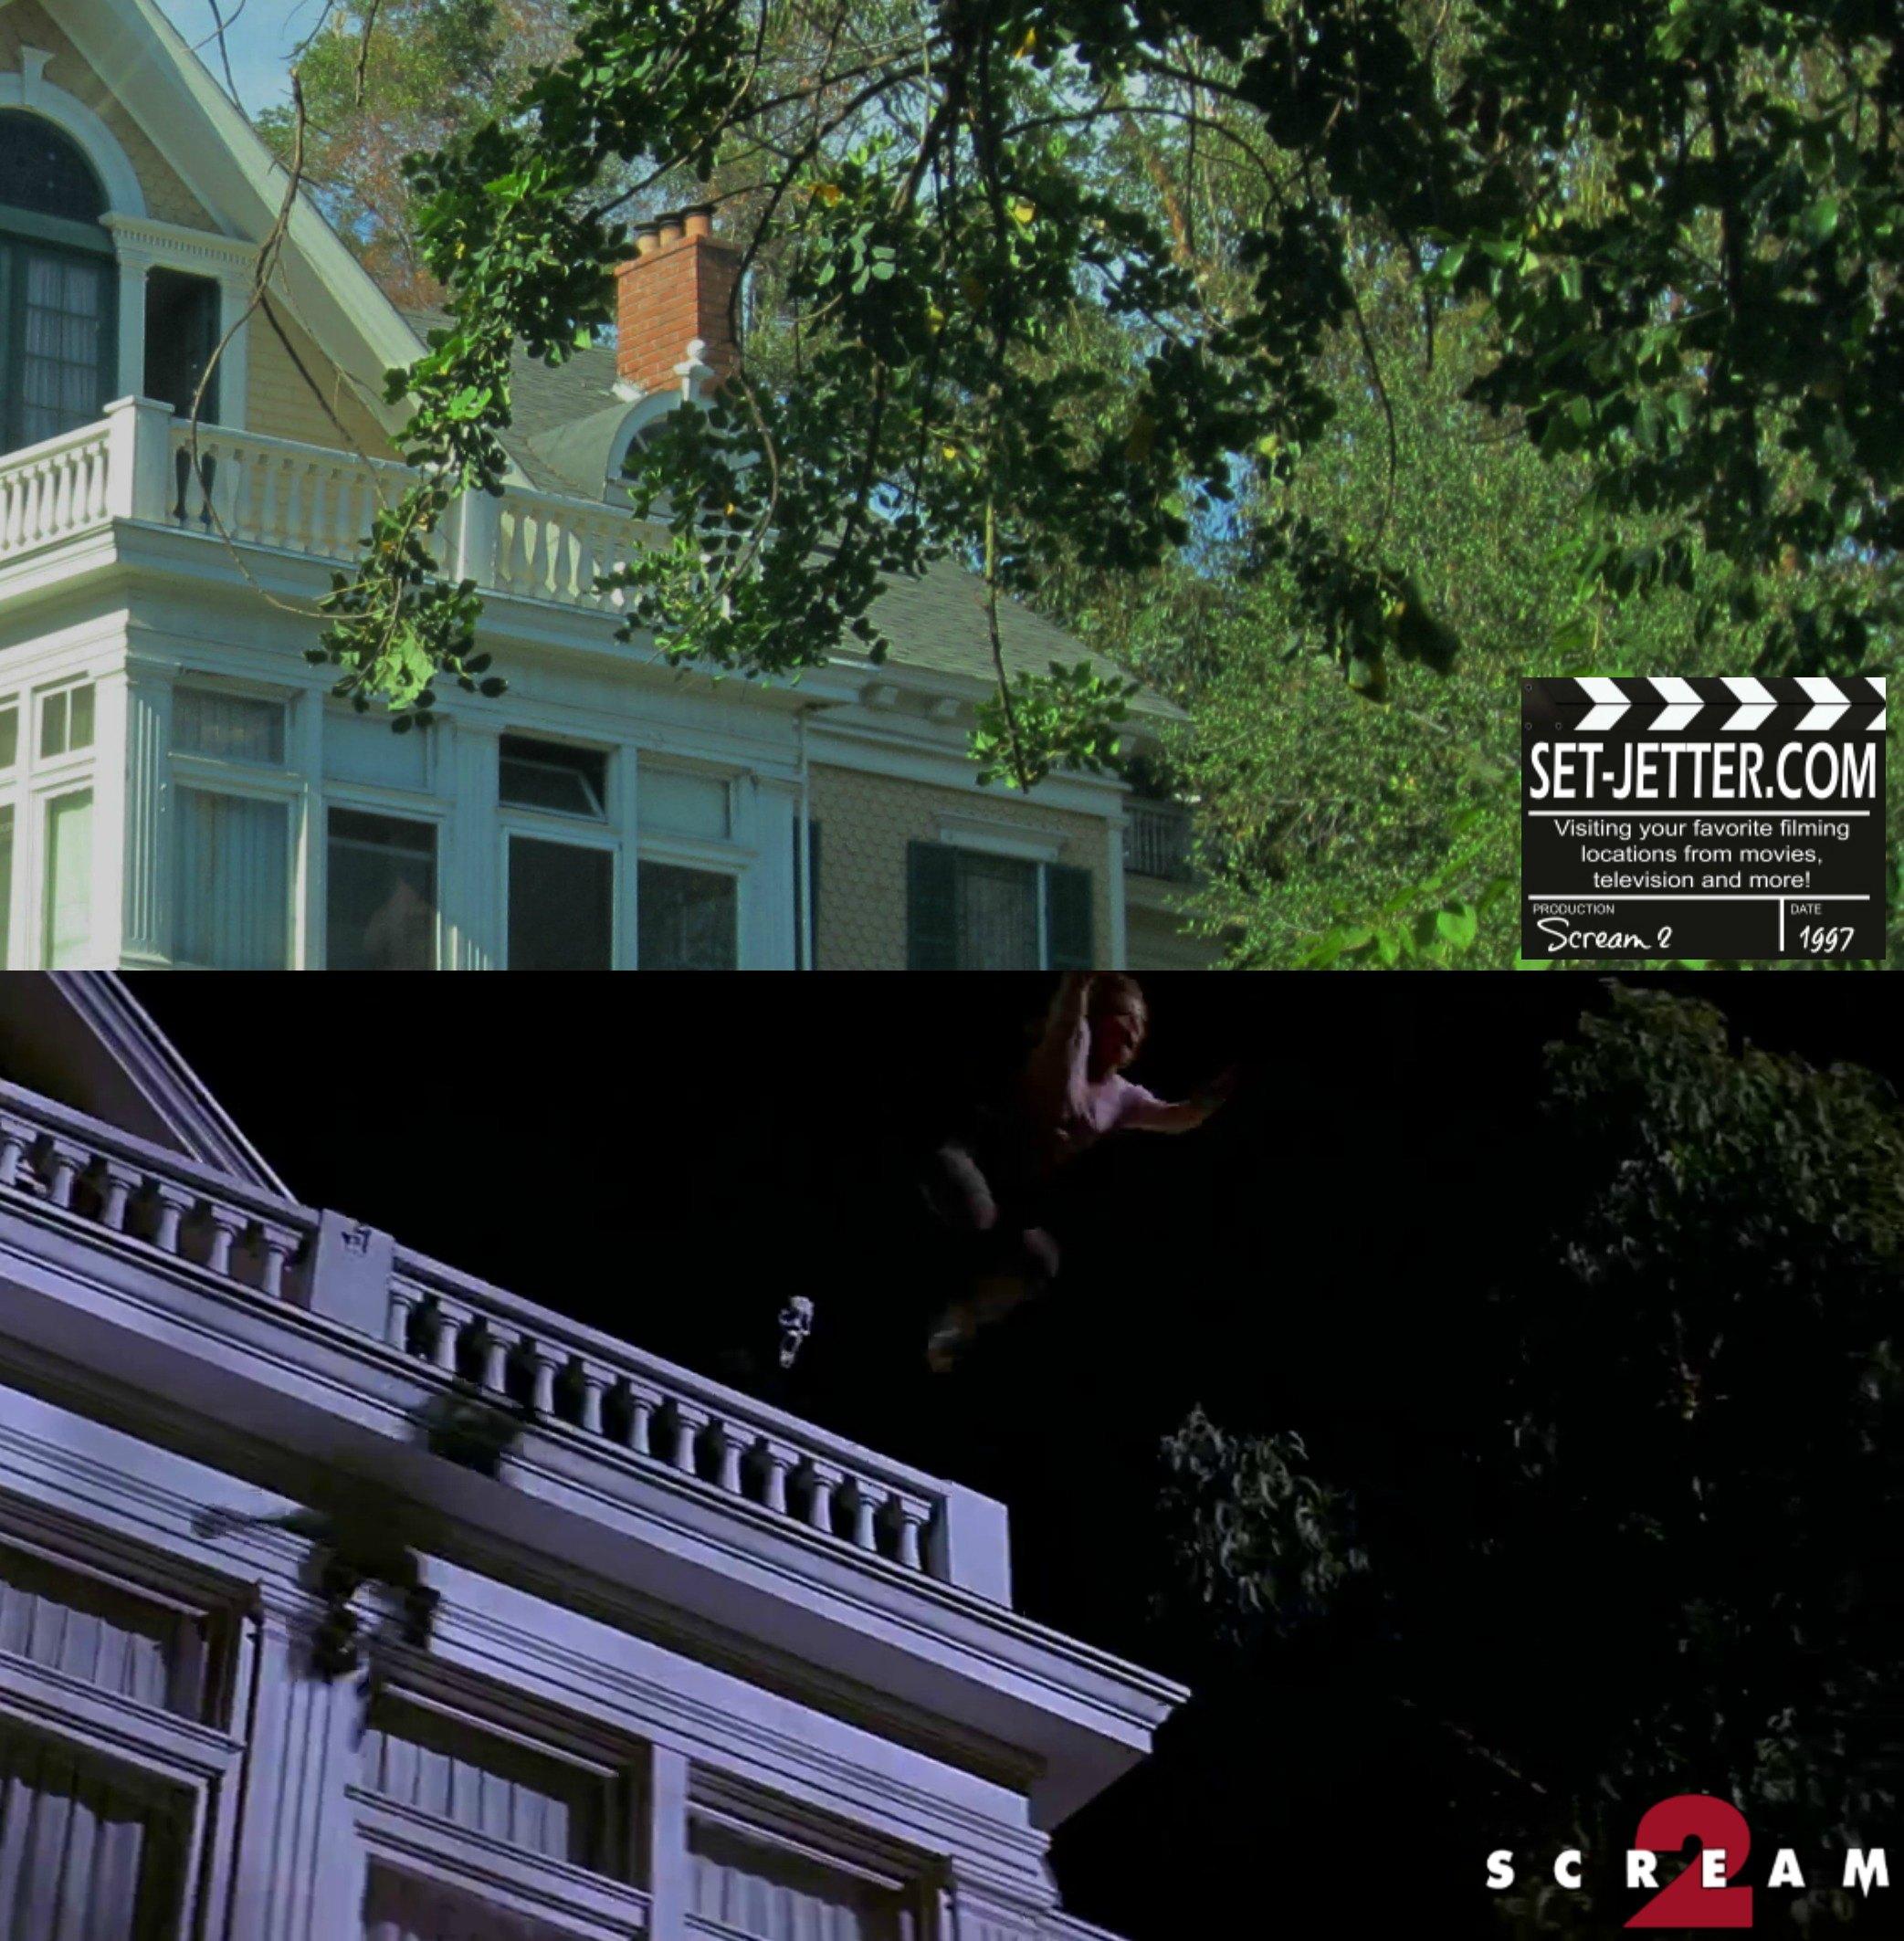 Scream 2 comparison 100.jpg